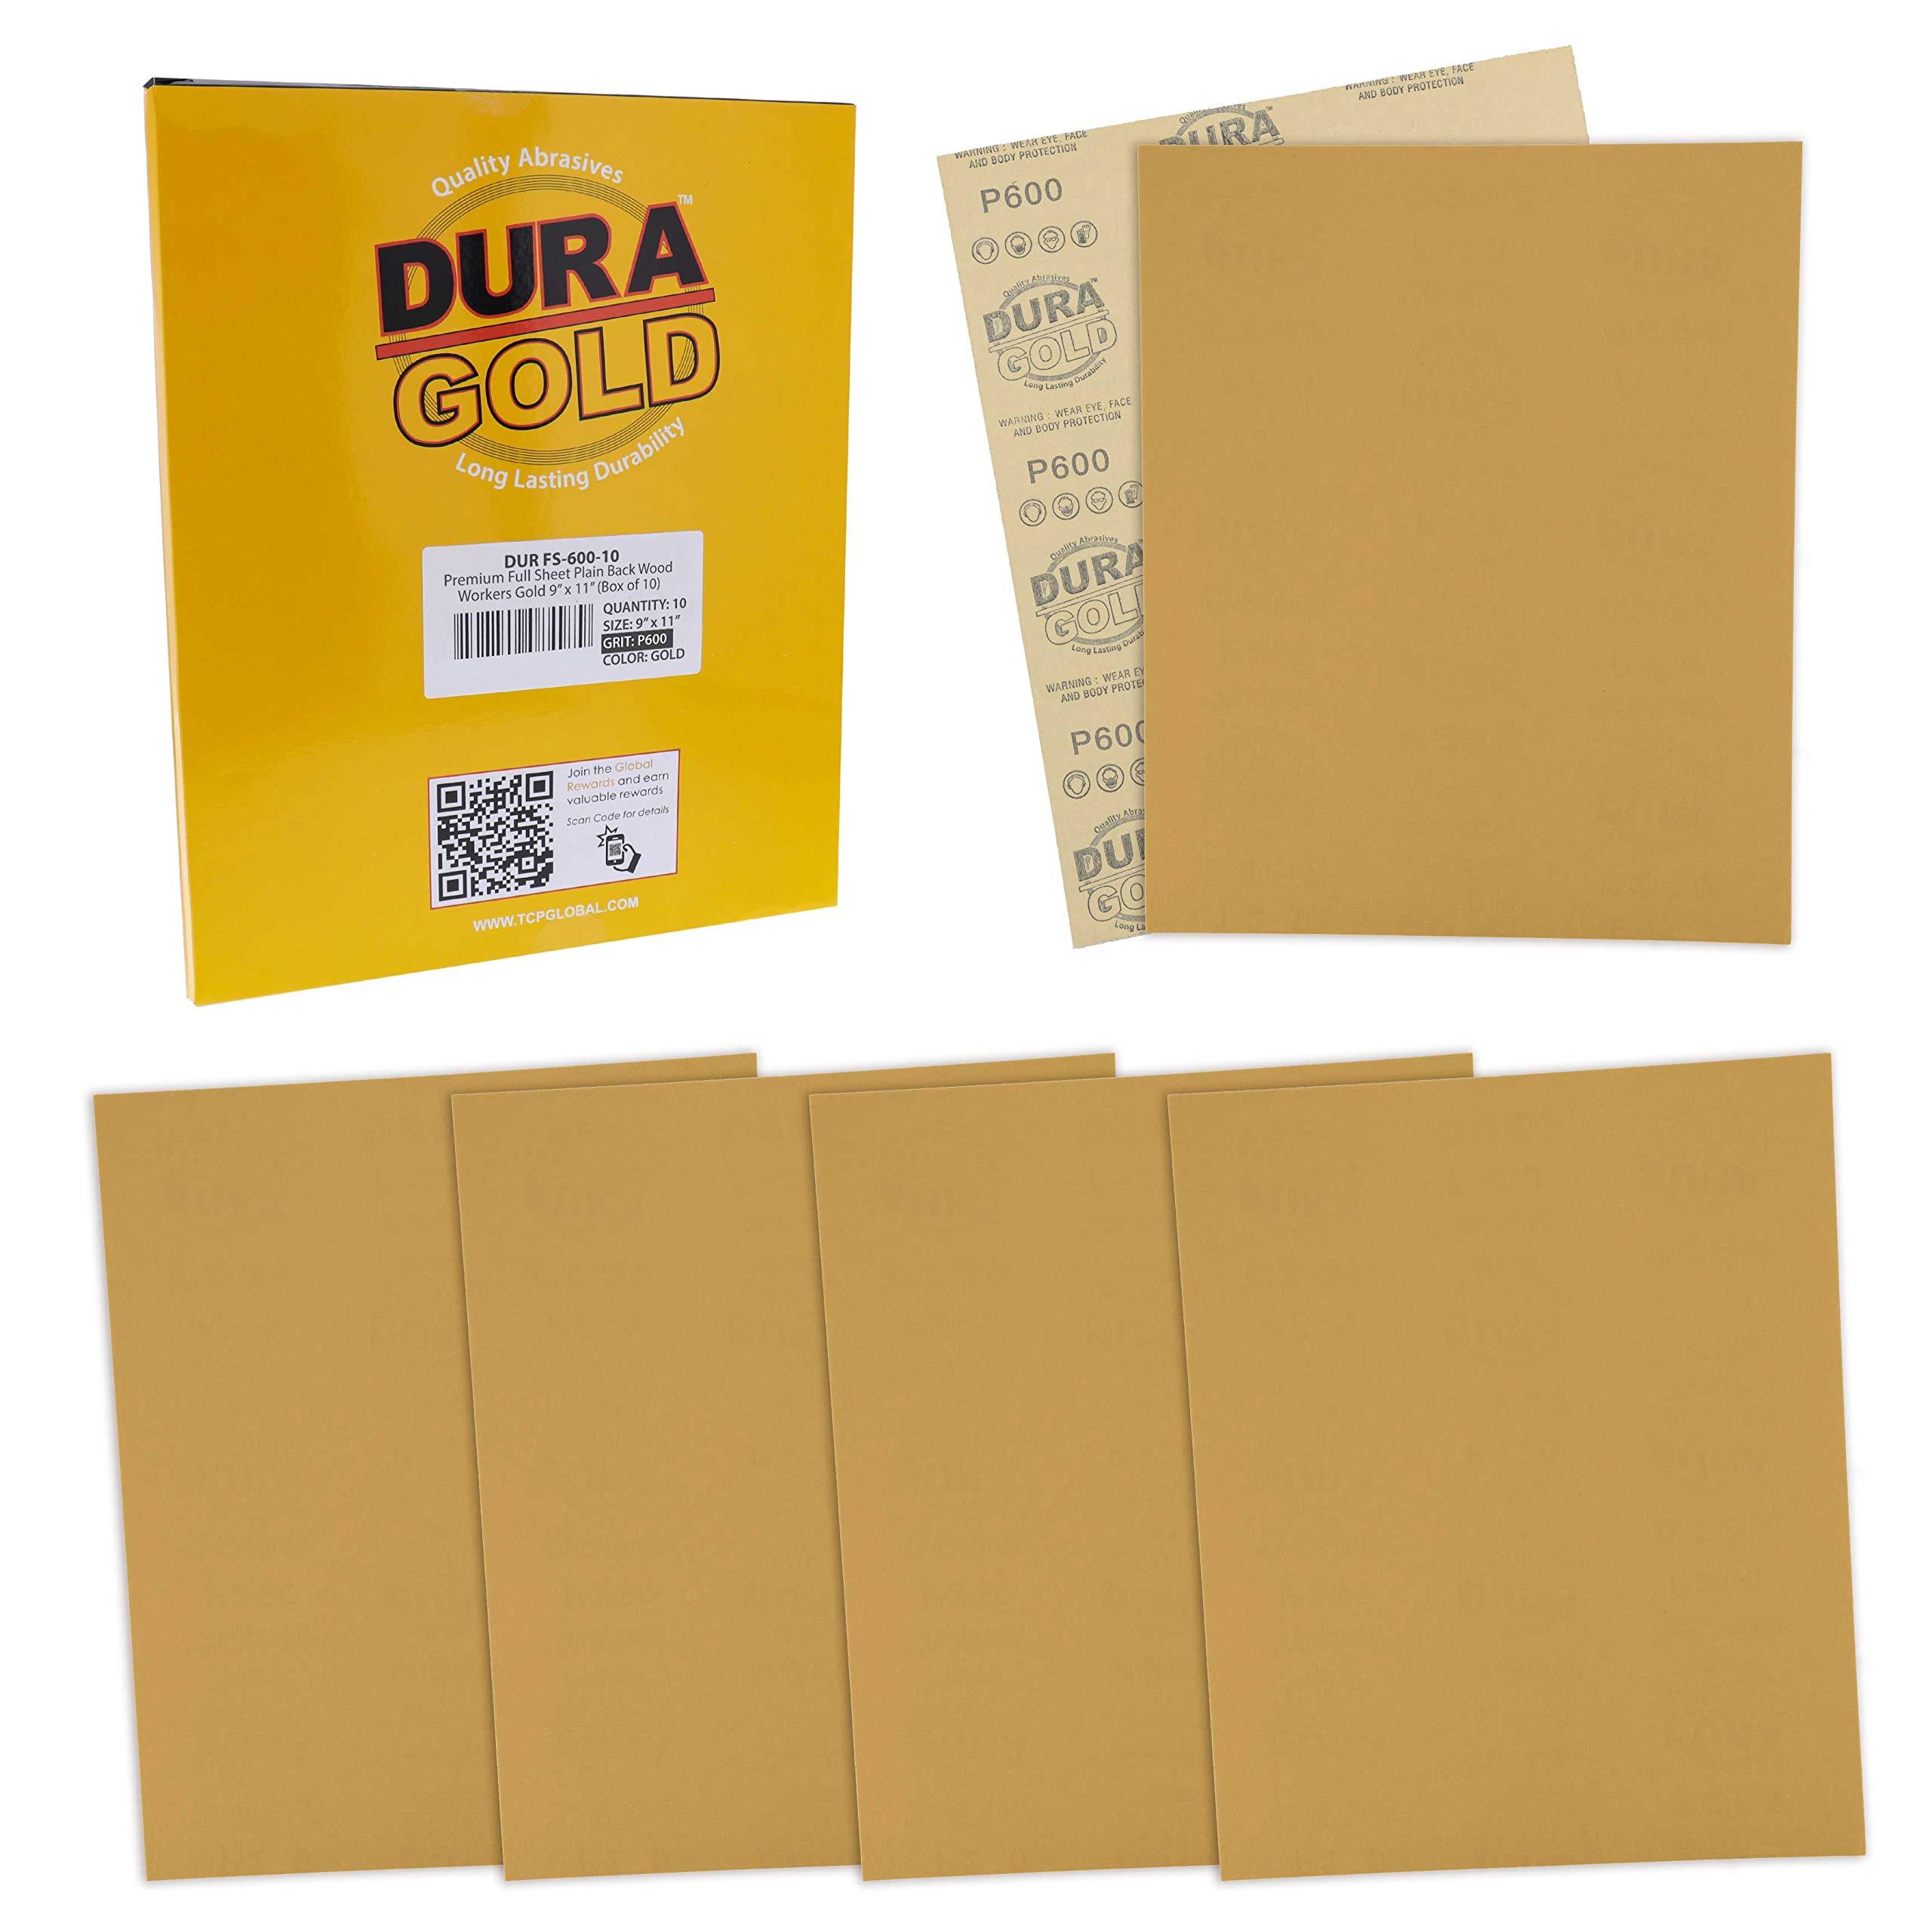 10 Lijas Dura-Gold 23cm x 28cm Grano 600